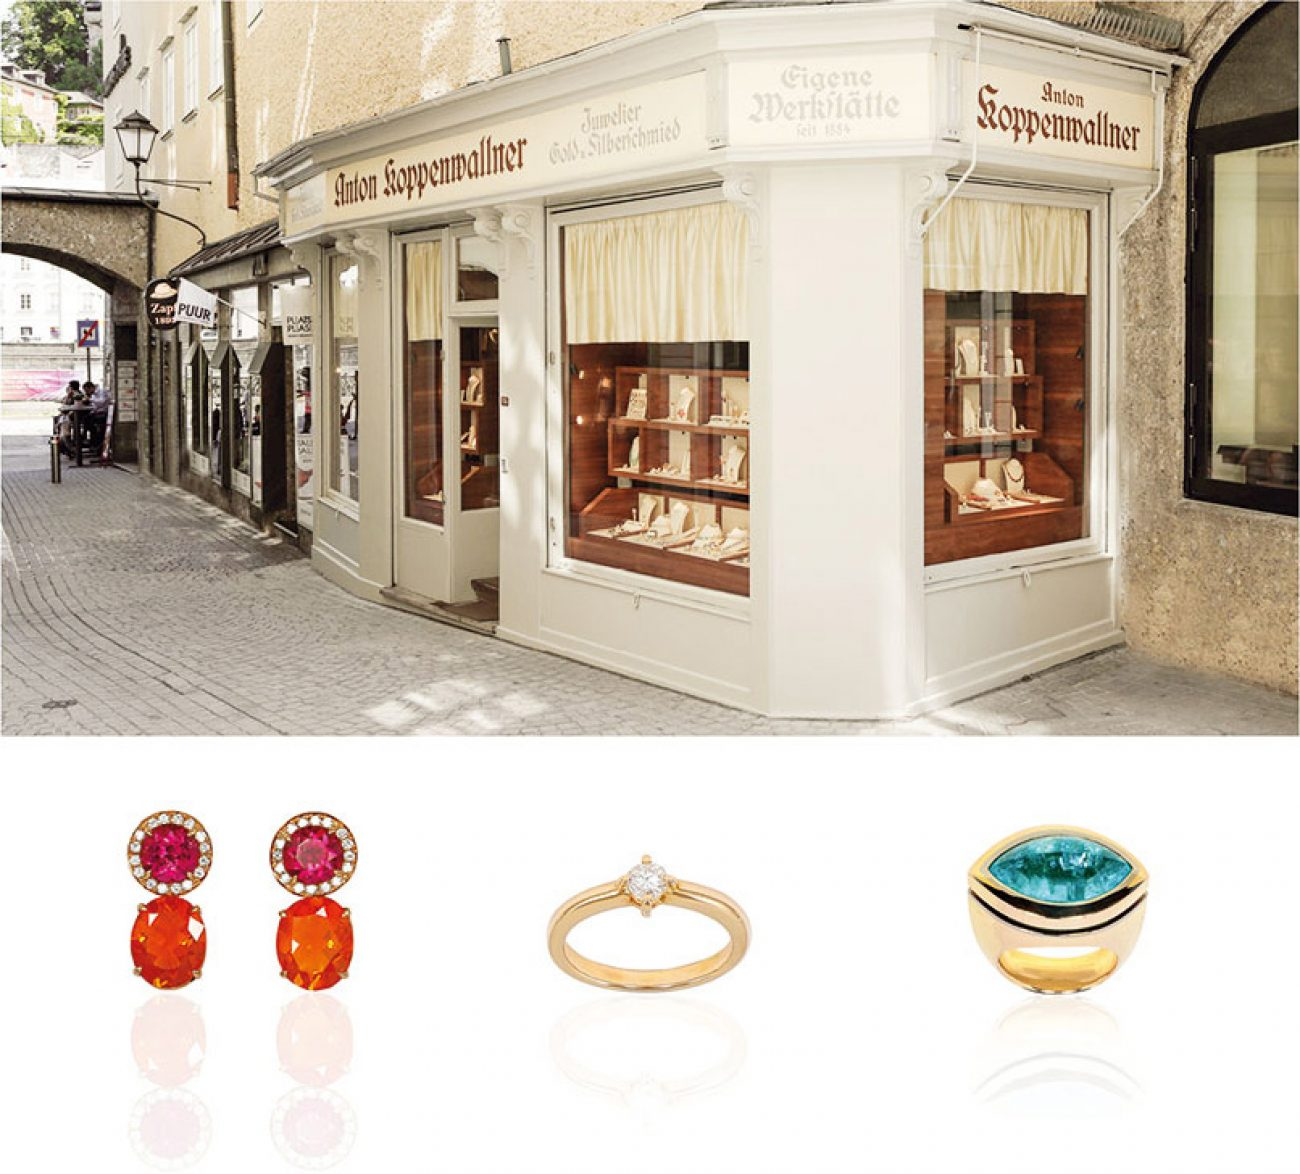 Salzburg Guide Shopping - Anton Koppenwallner